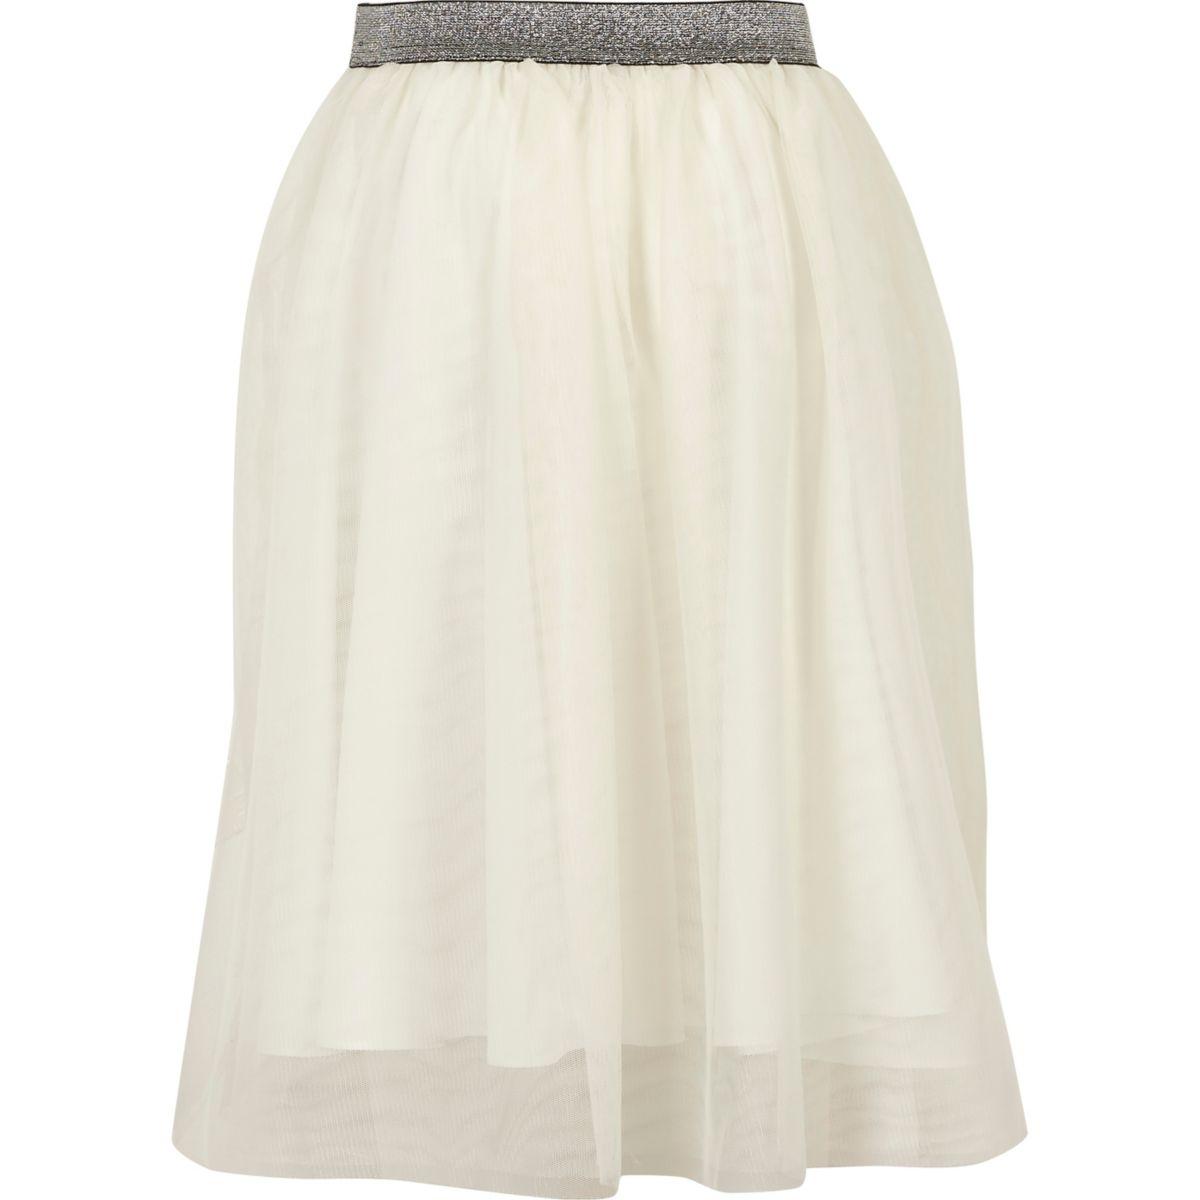 Girls white mesh midi skirt